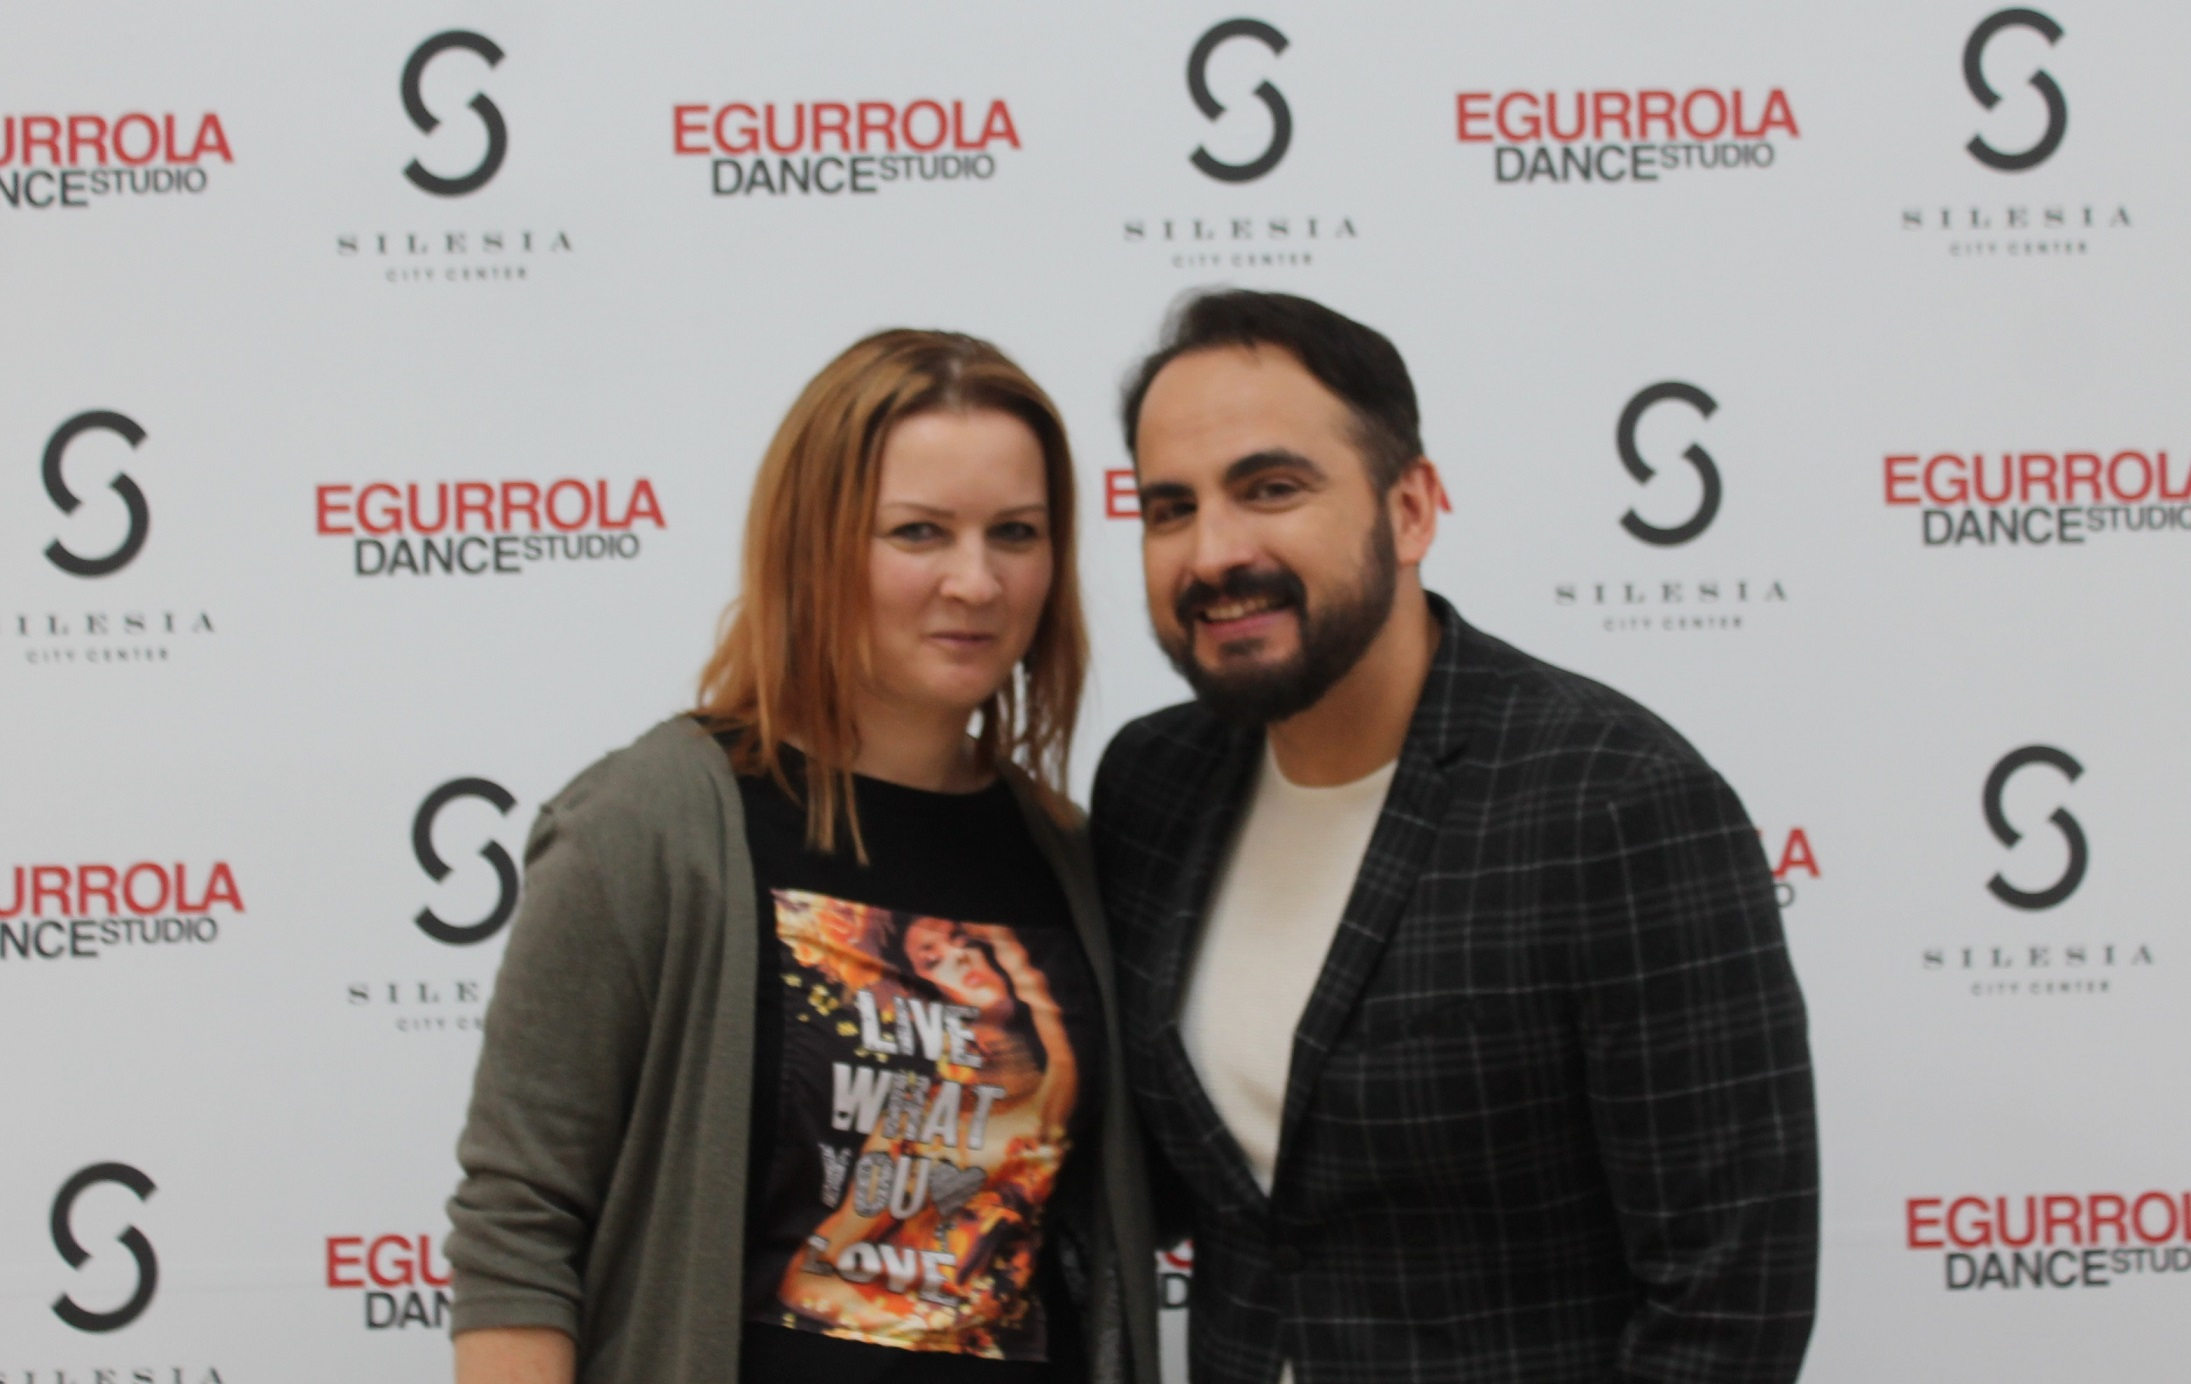 wywiad z Agustinem Egurrolą